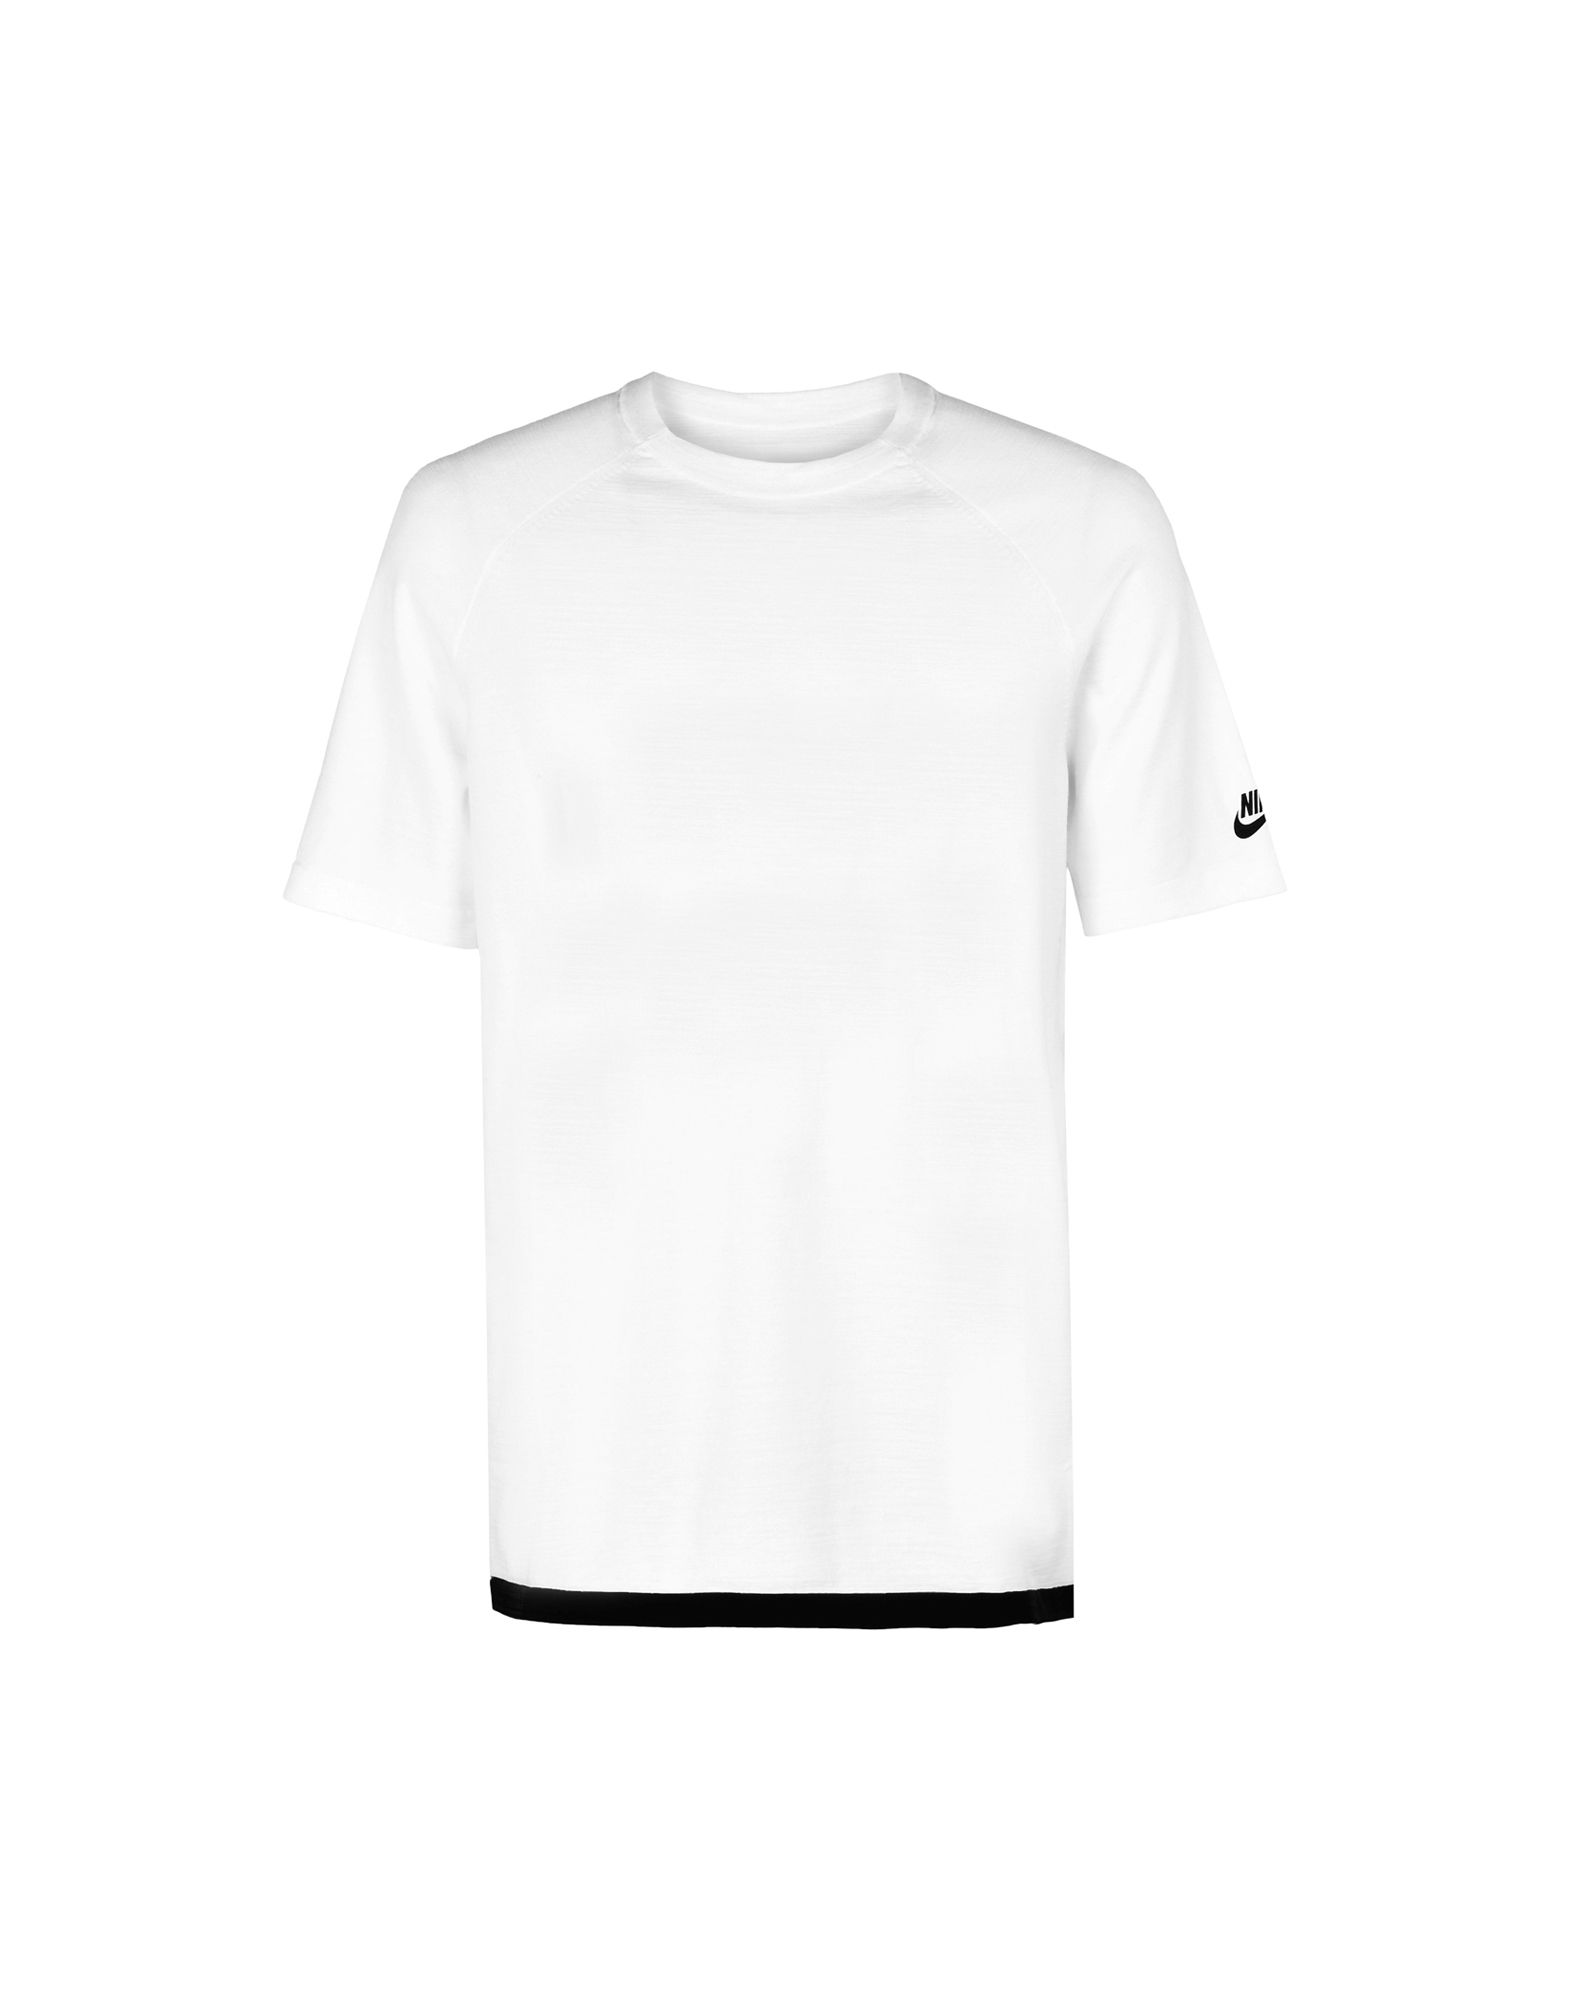 Pullover Nike  Tech Knit Top Short Sleeve - Uomo - Acquista online su